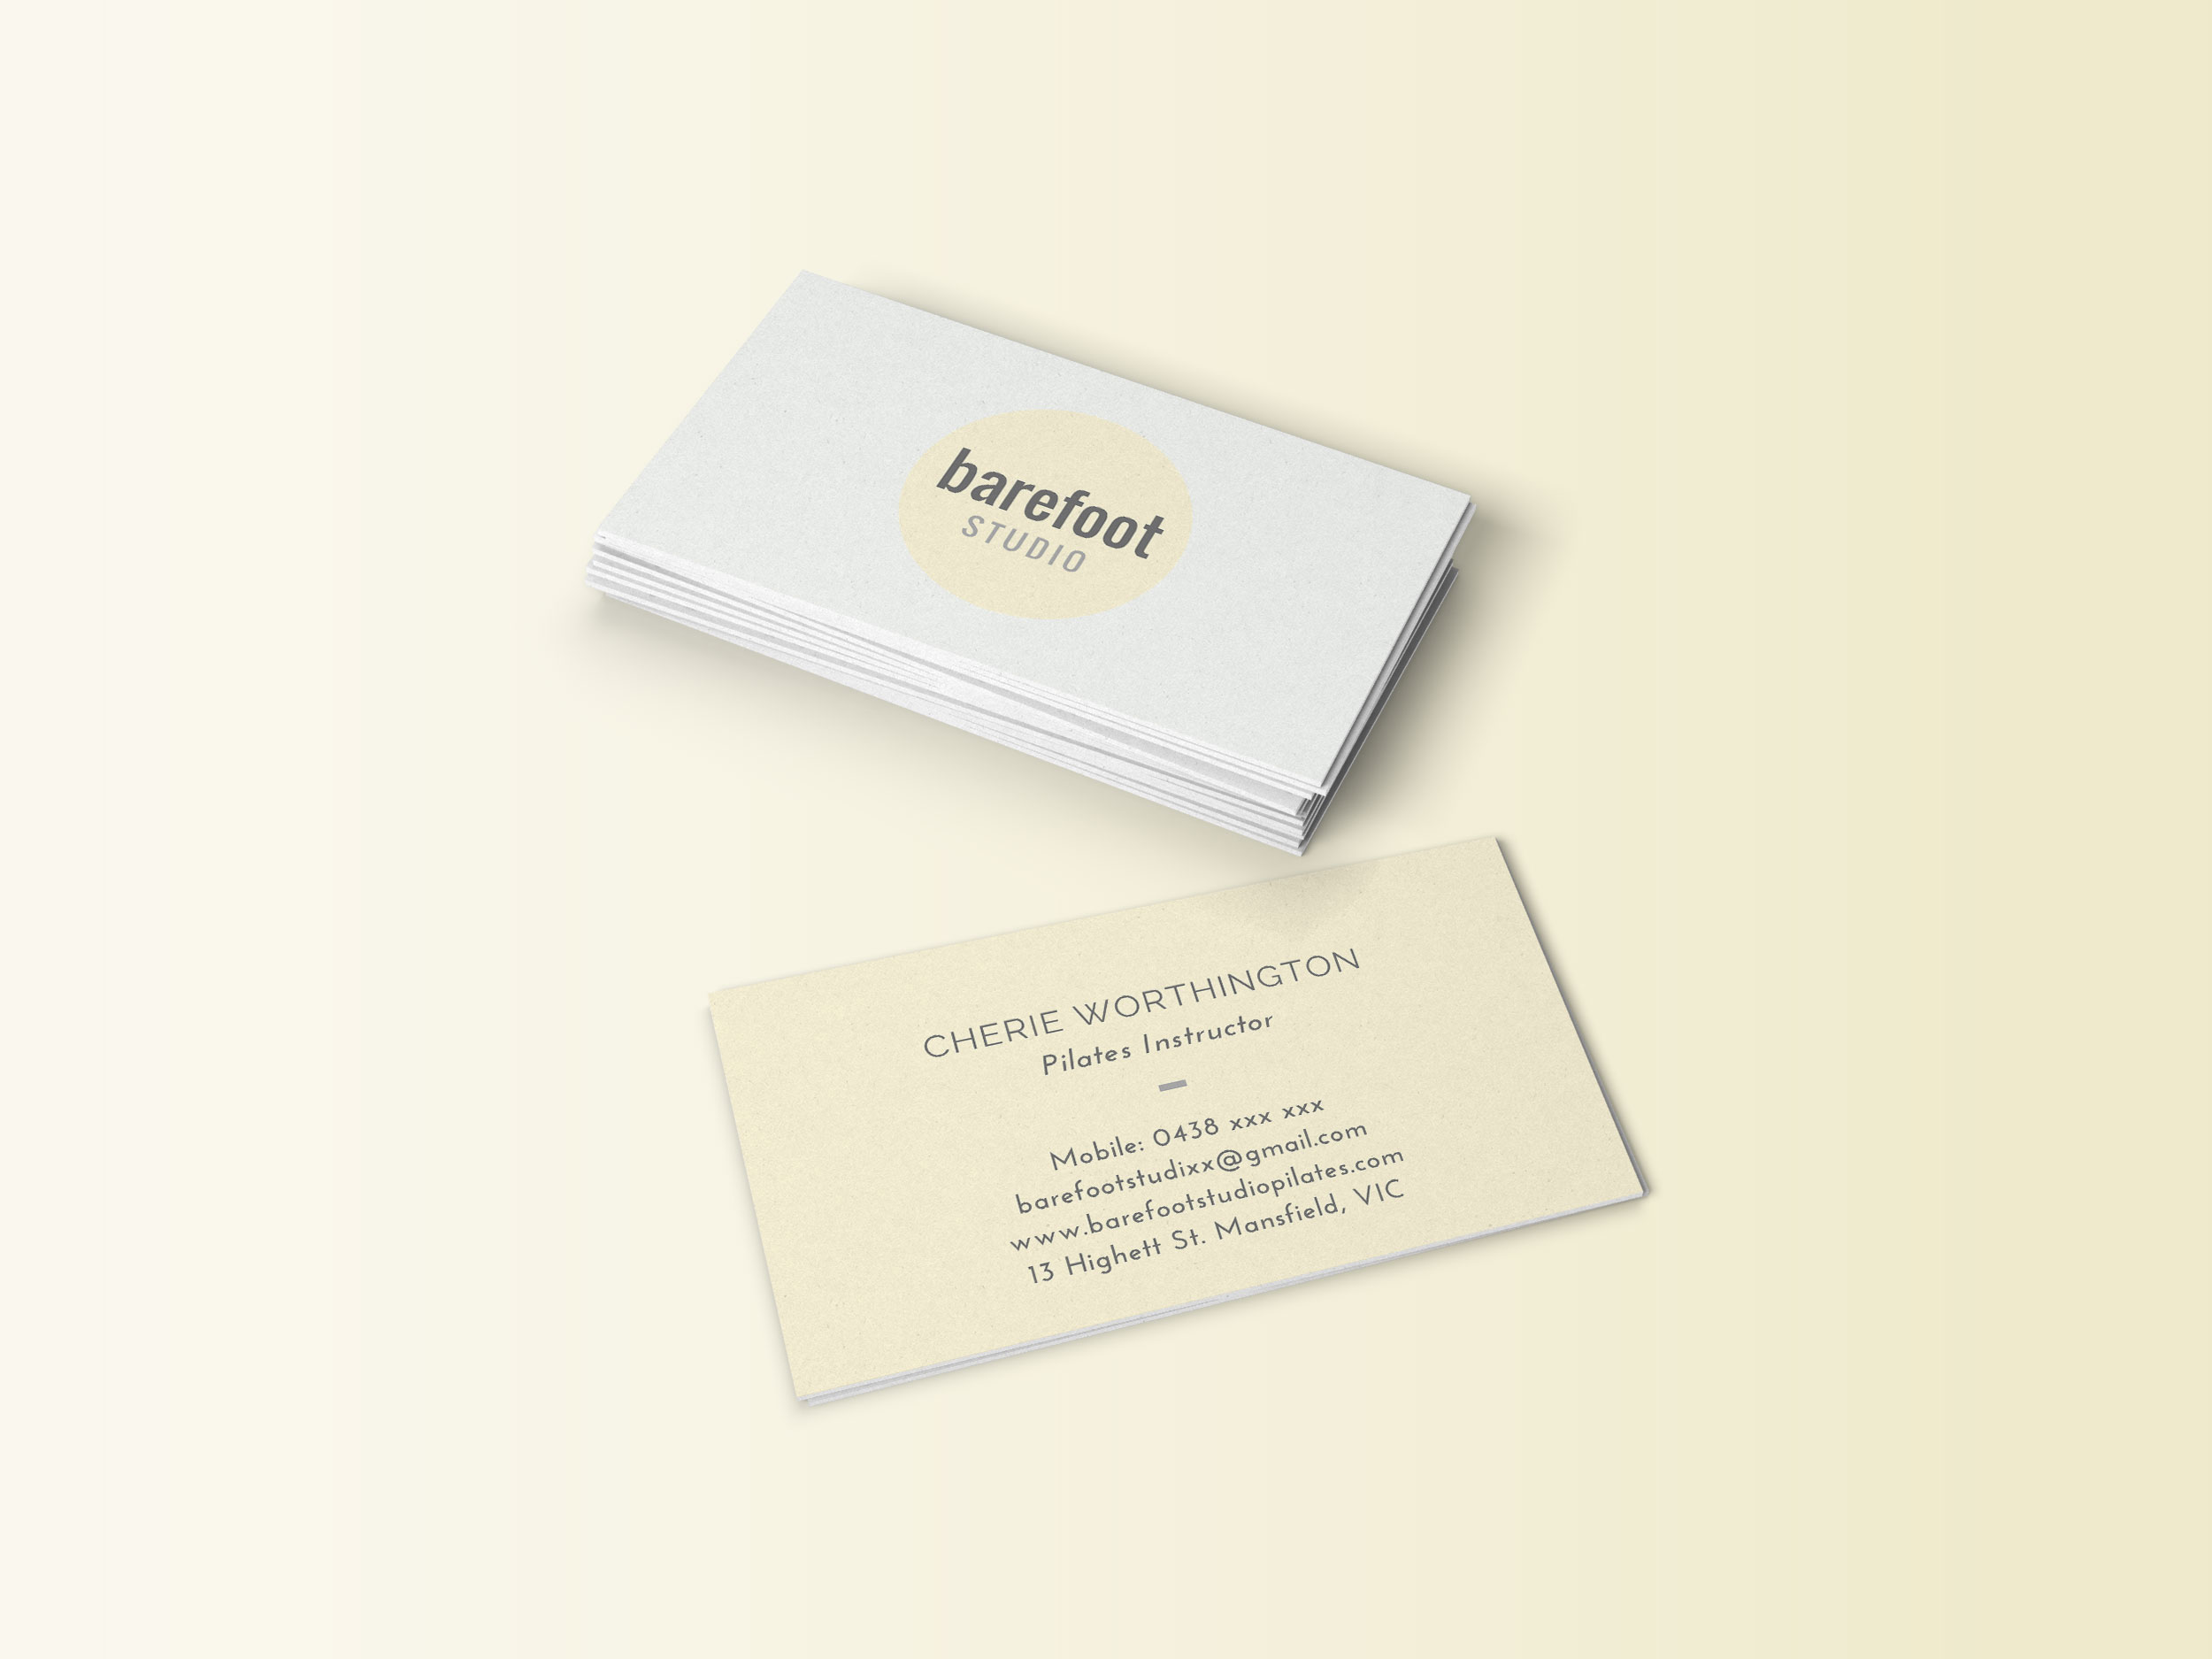 pilates-business-card-design-print-australia